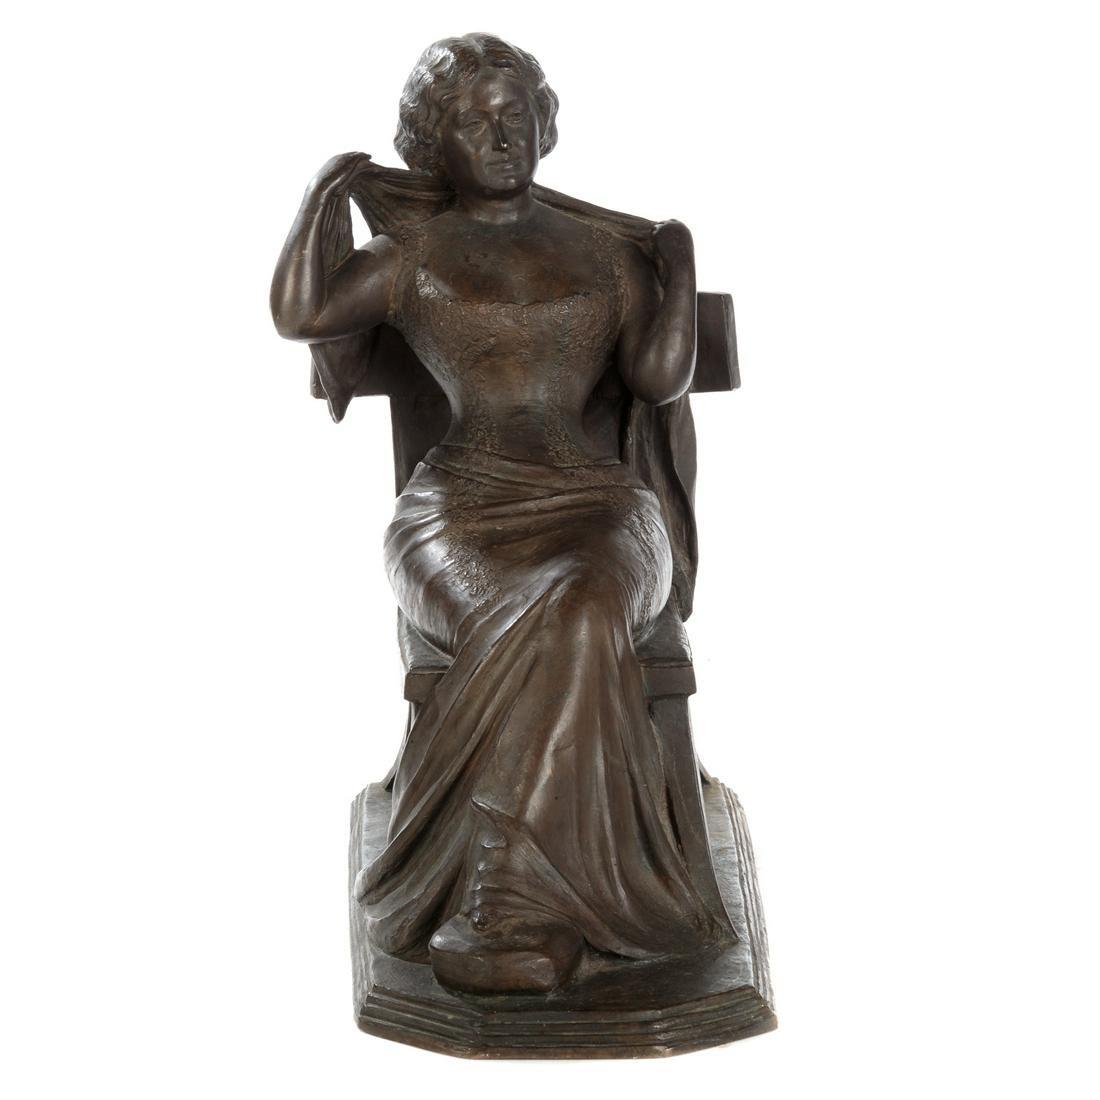 Jonathan S. Hartley Seated Woman Bronze